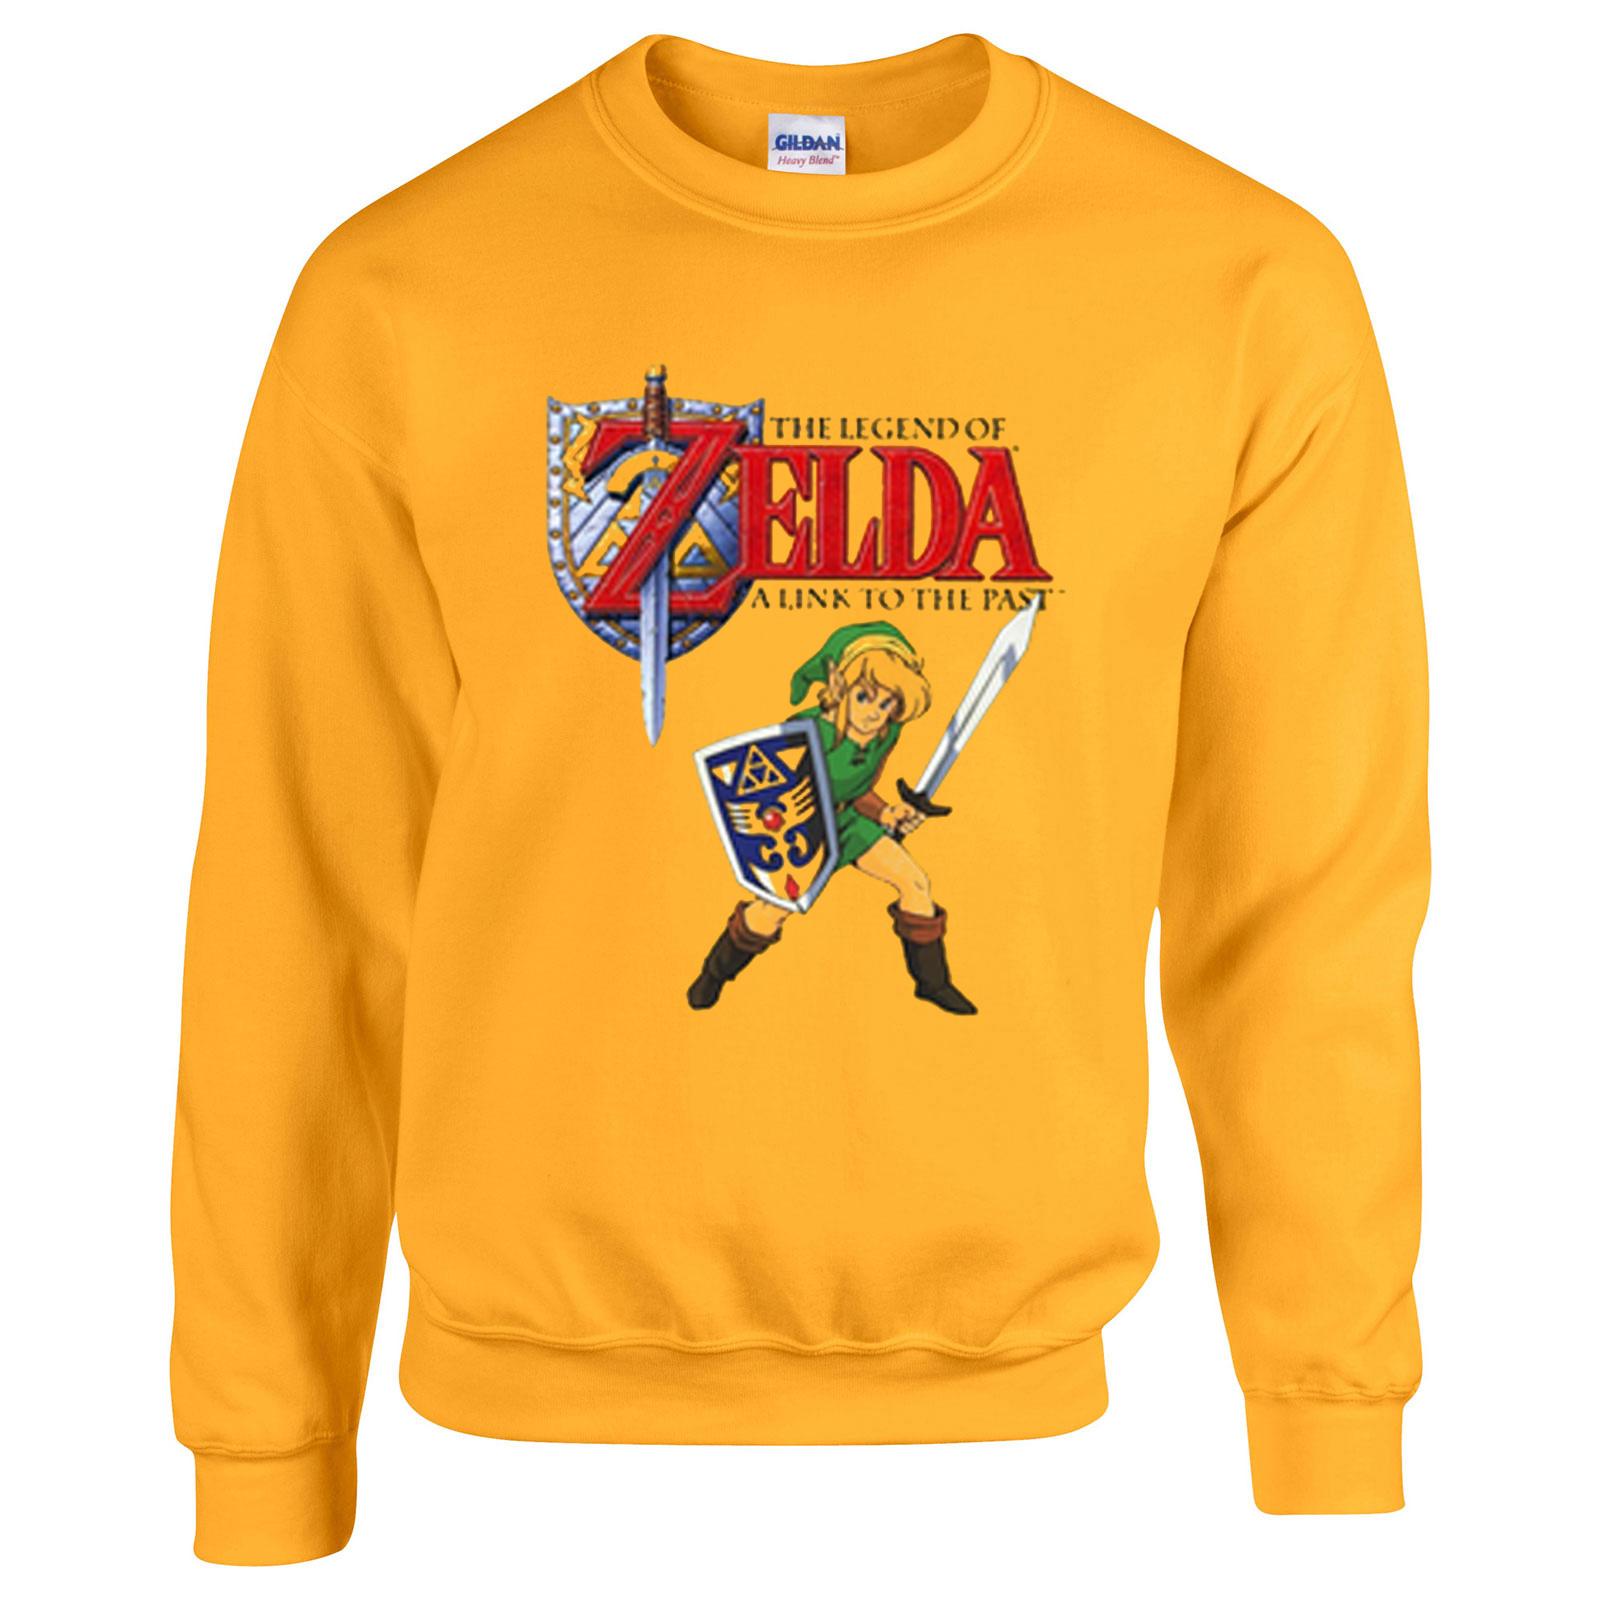 cbbe5e3c4 The Legend Of Zelda A Link To The Past Sweatshirt